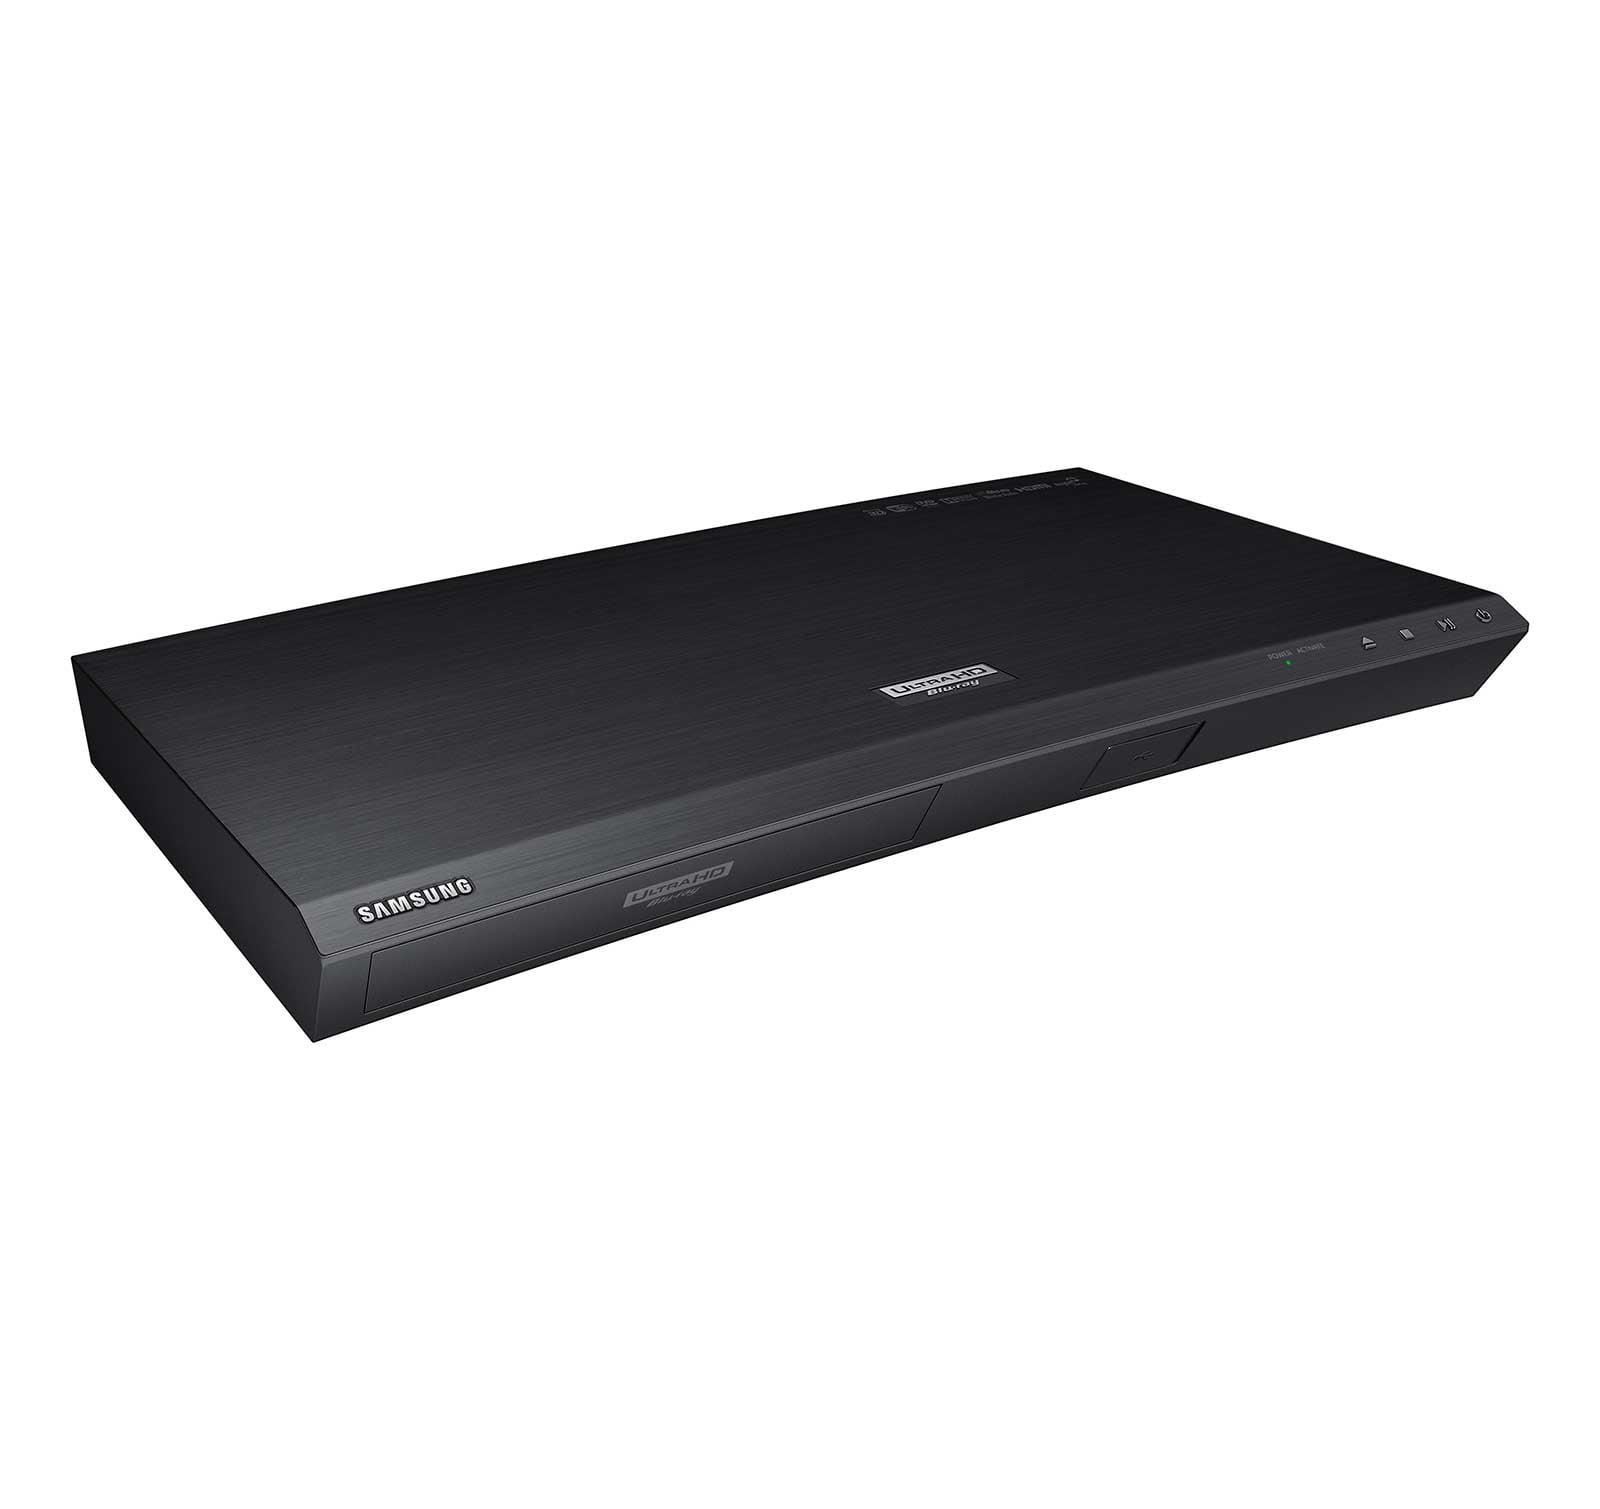 O Blu ray Samsung UBD-K8500 - caja abierta 4 K Ultra HD Blu-ray Player + Samsung en VeoyCompro.com.co